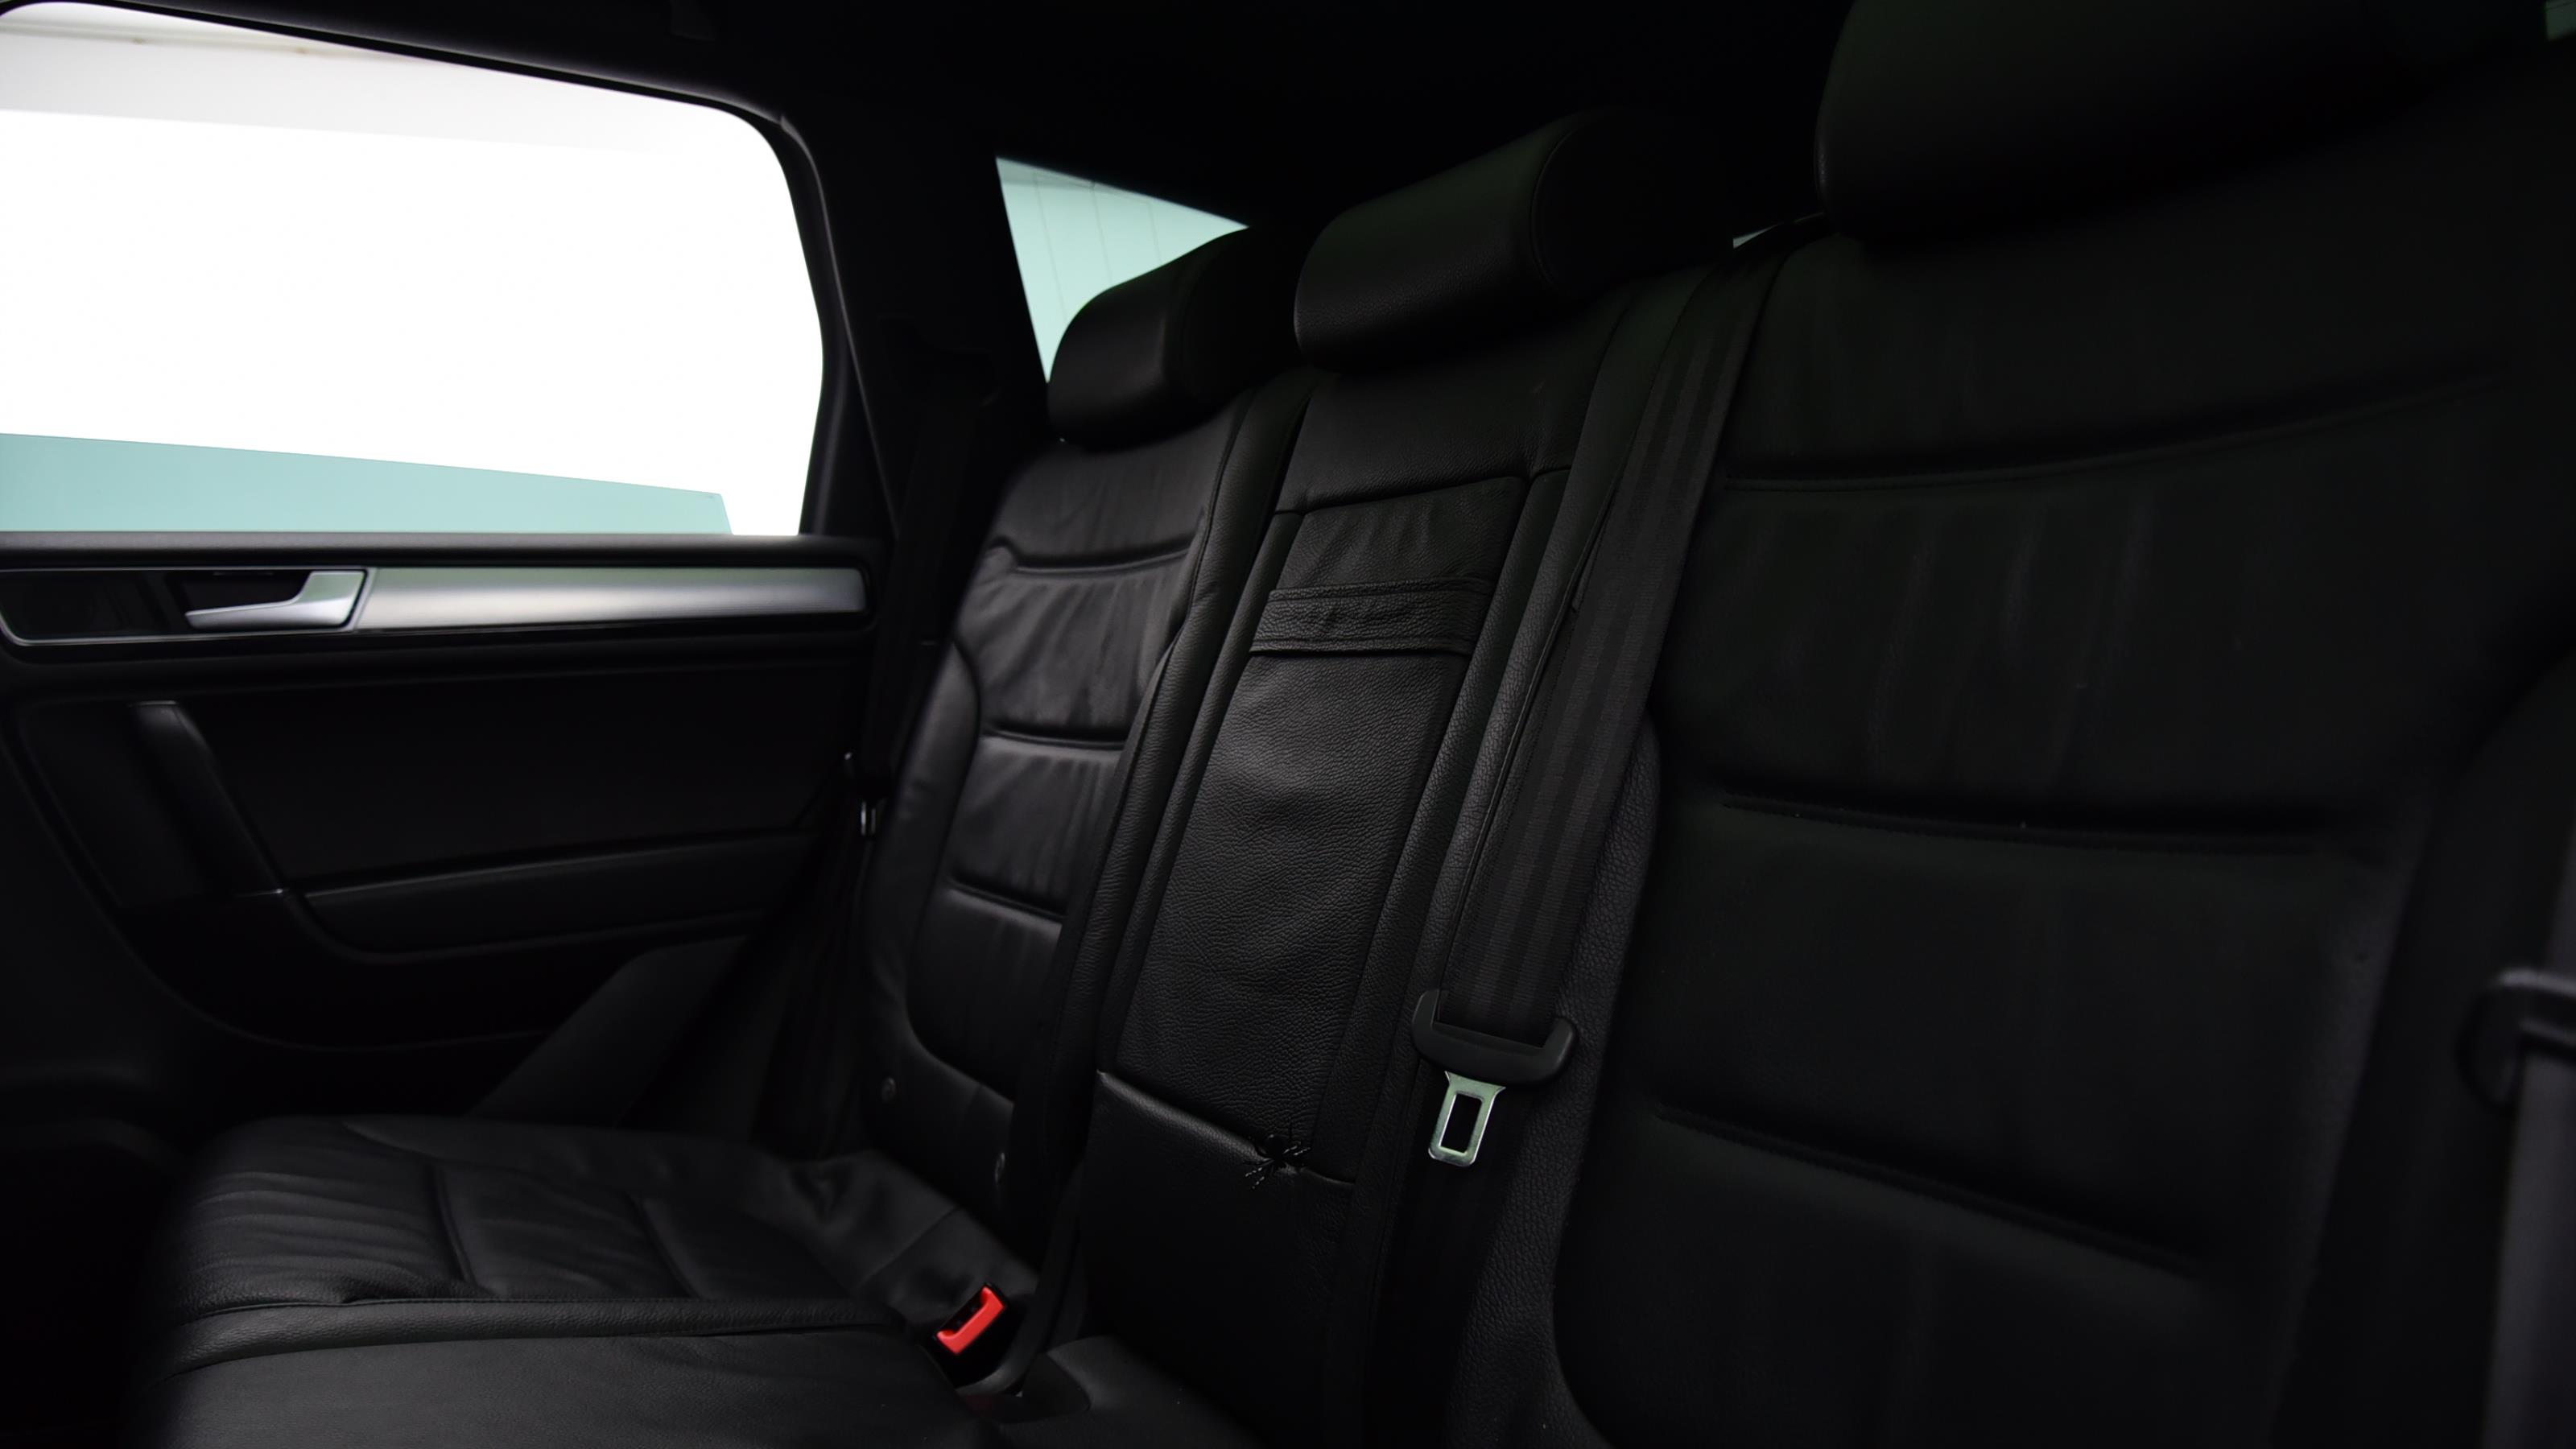 Used 2015 Volkswagen TOUAREG 3.0 V6 TDI BlueMotion Tech 262 R Line 5dr Tip Auto WHITE at Saxton4x4